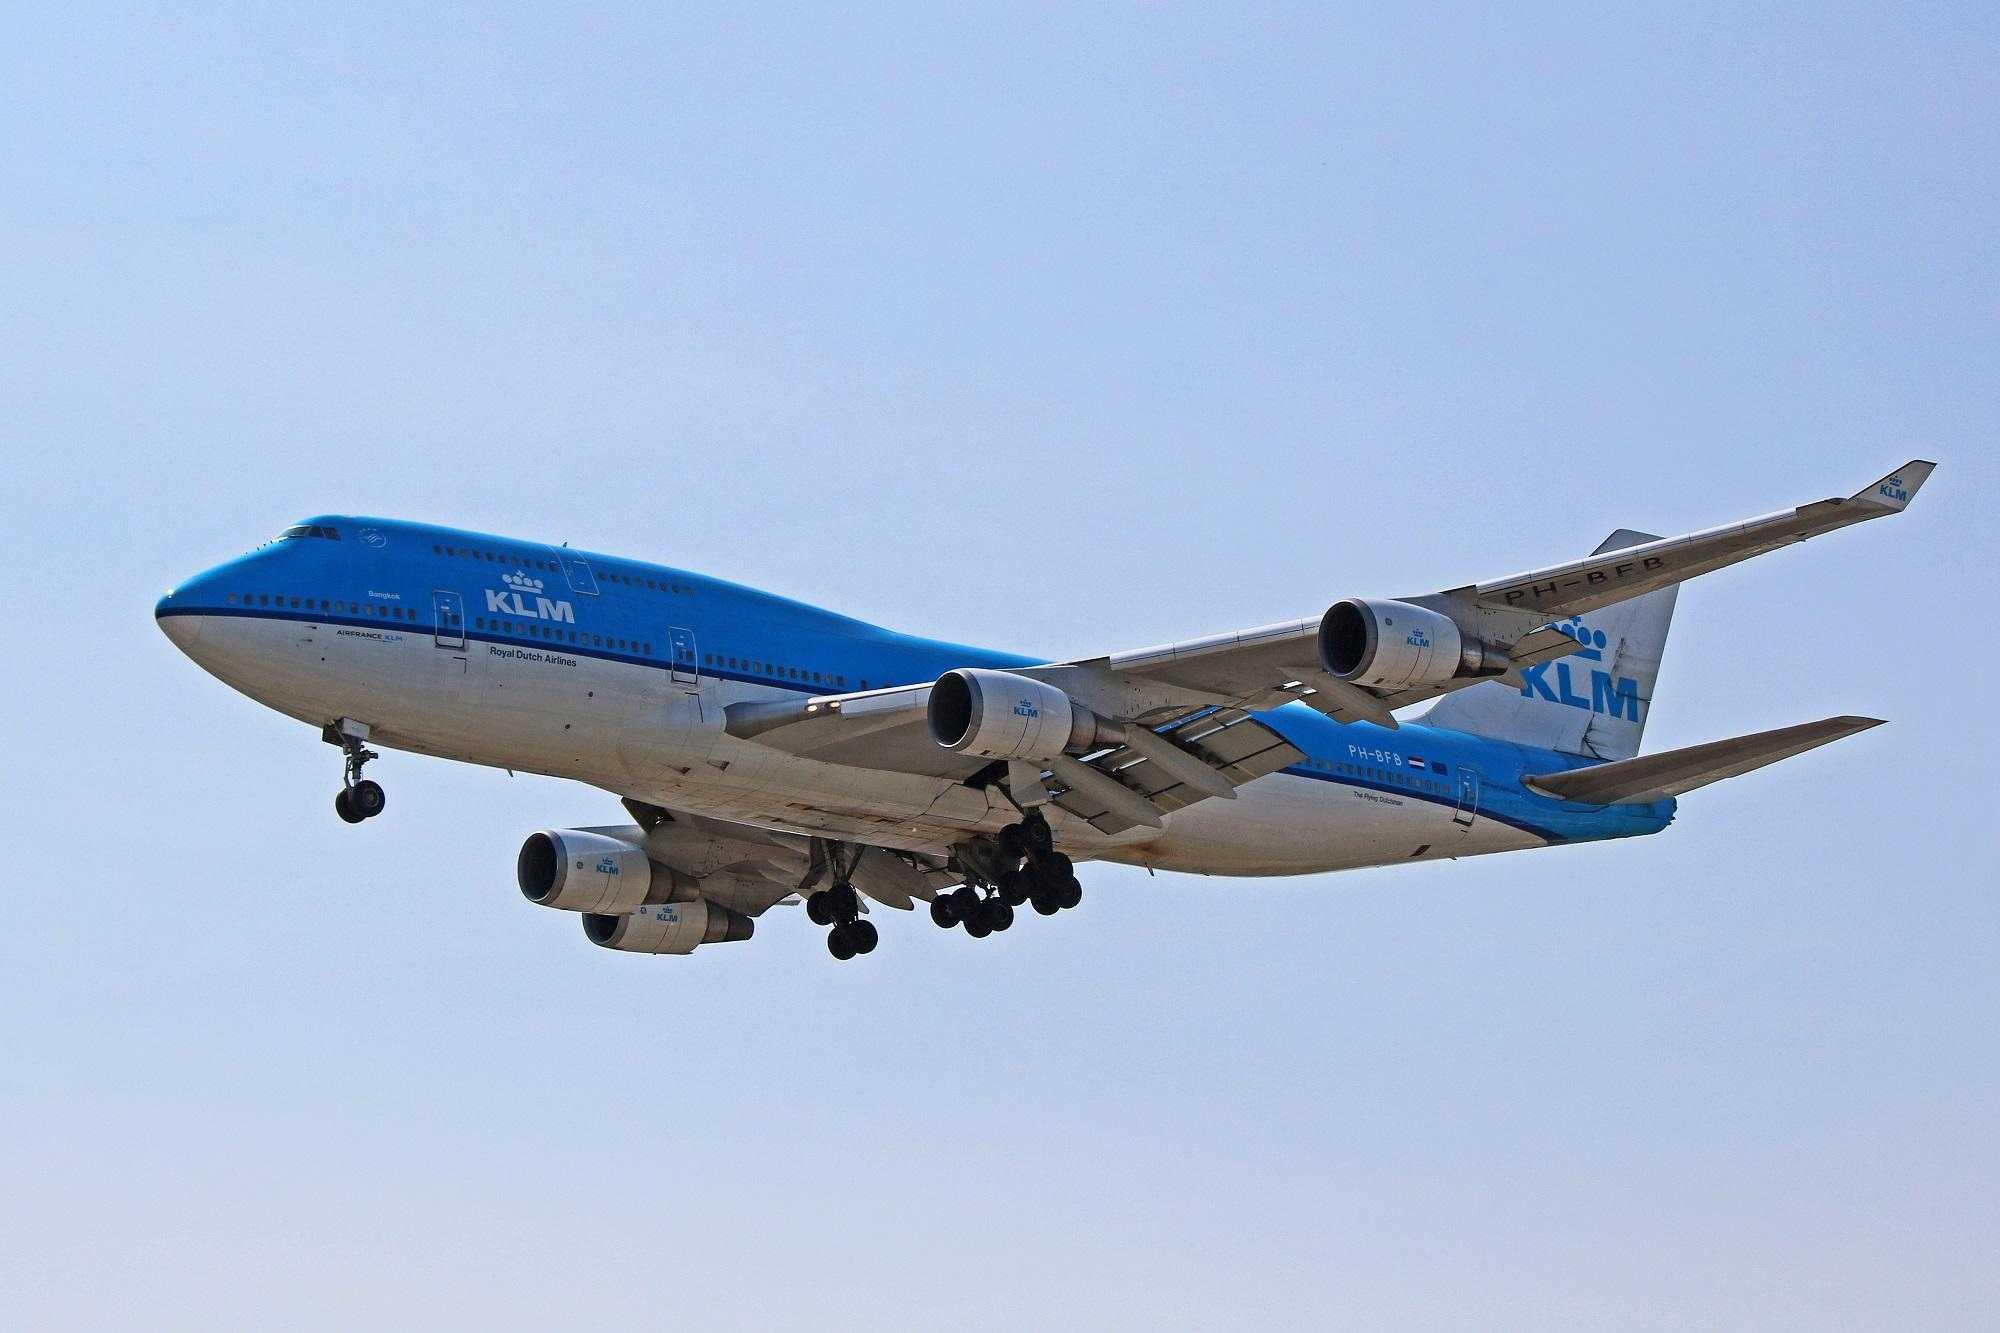 ph-bfb-klm-boeing-747-400.jpg